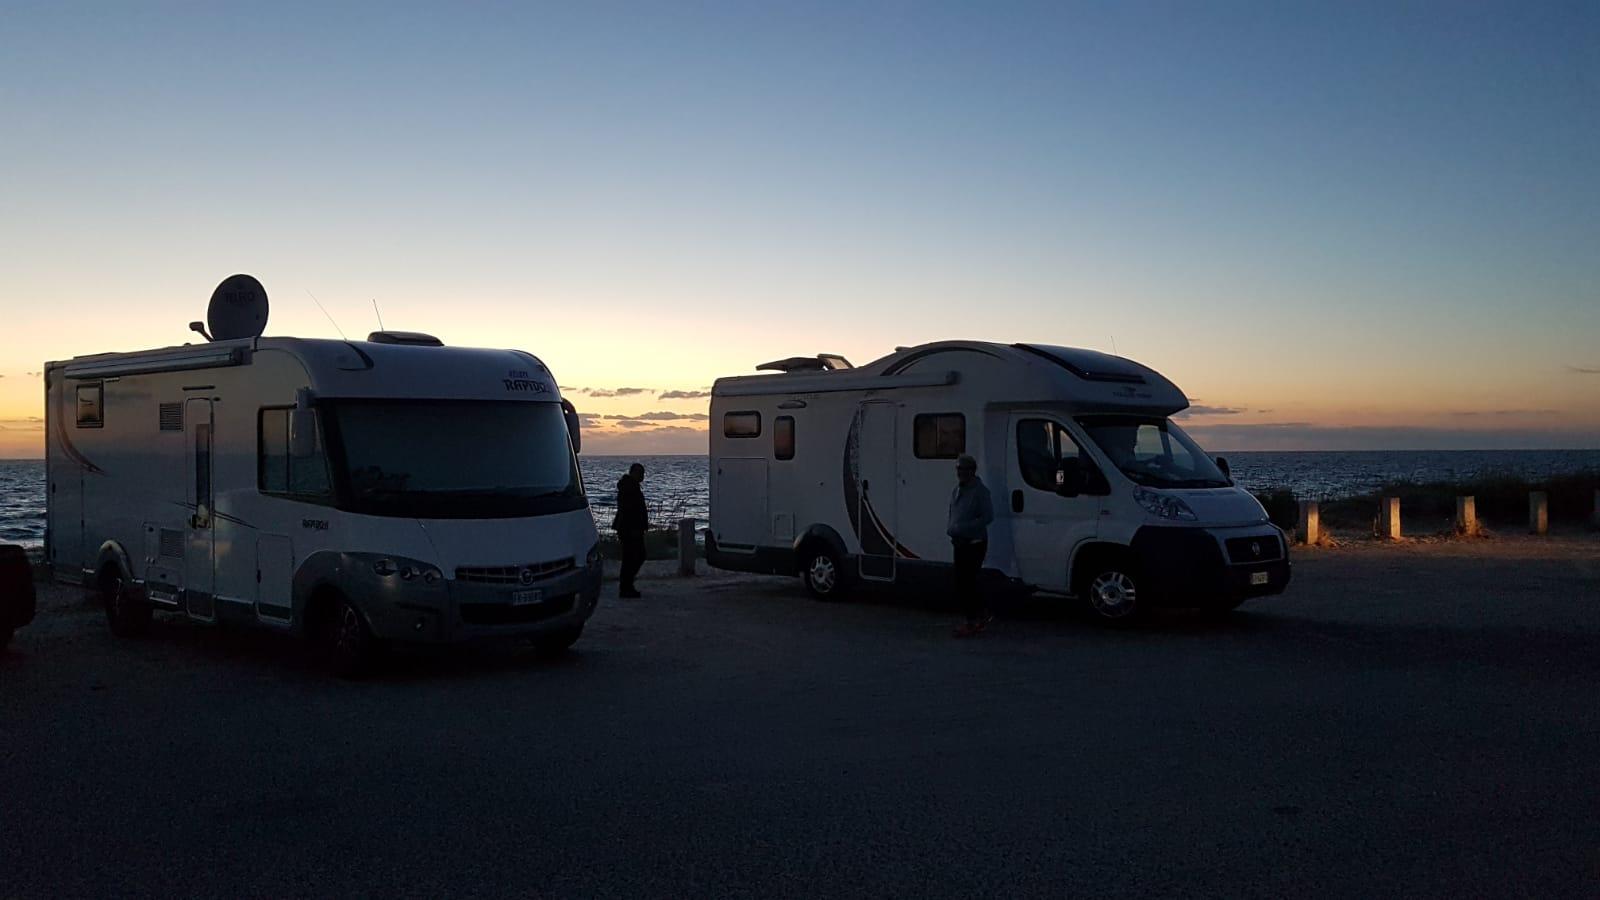 cliente-mm-camper-vacanze-norvegia-danimarca